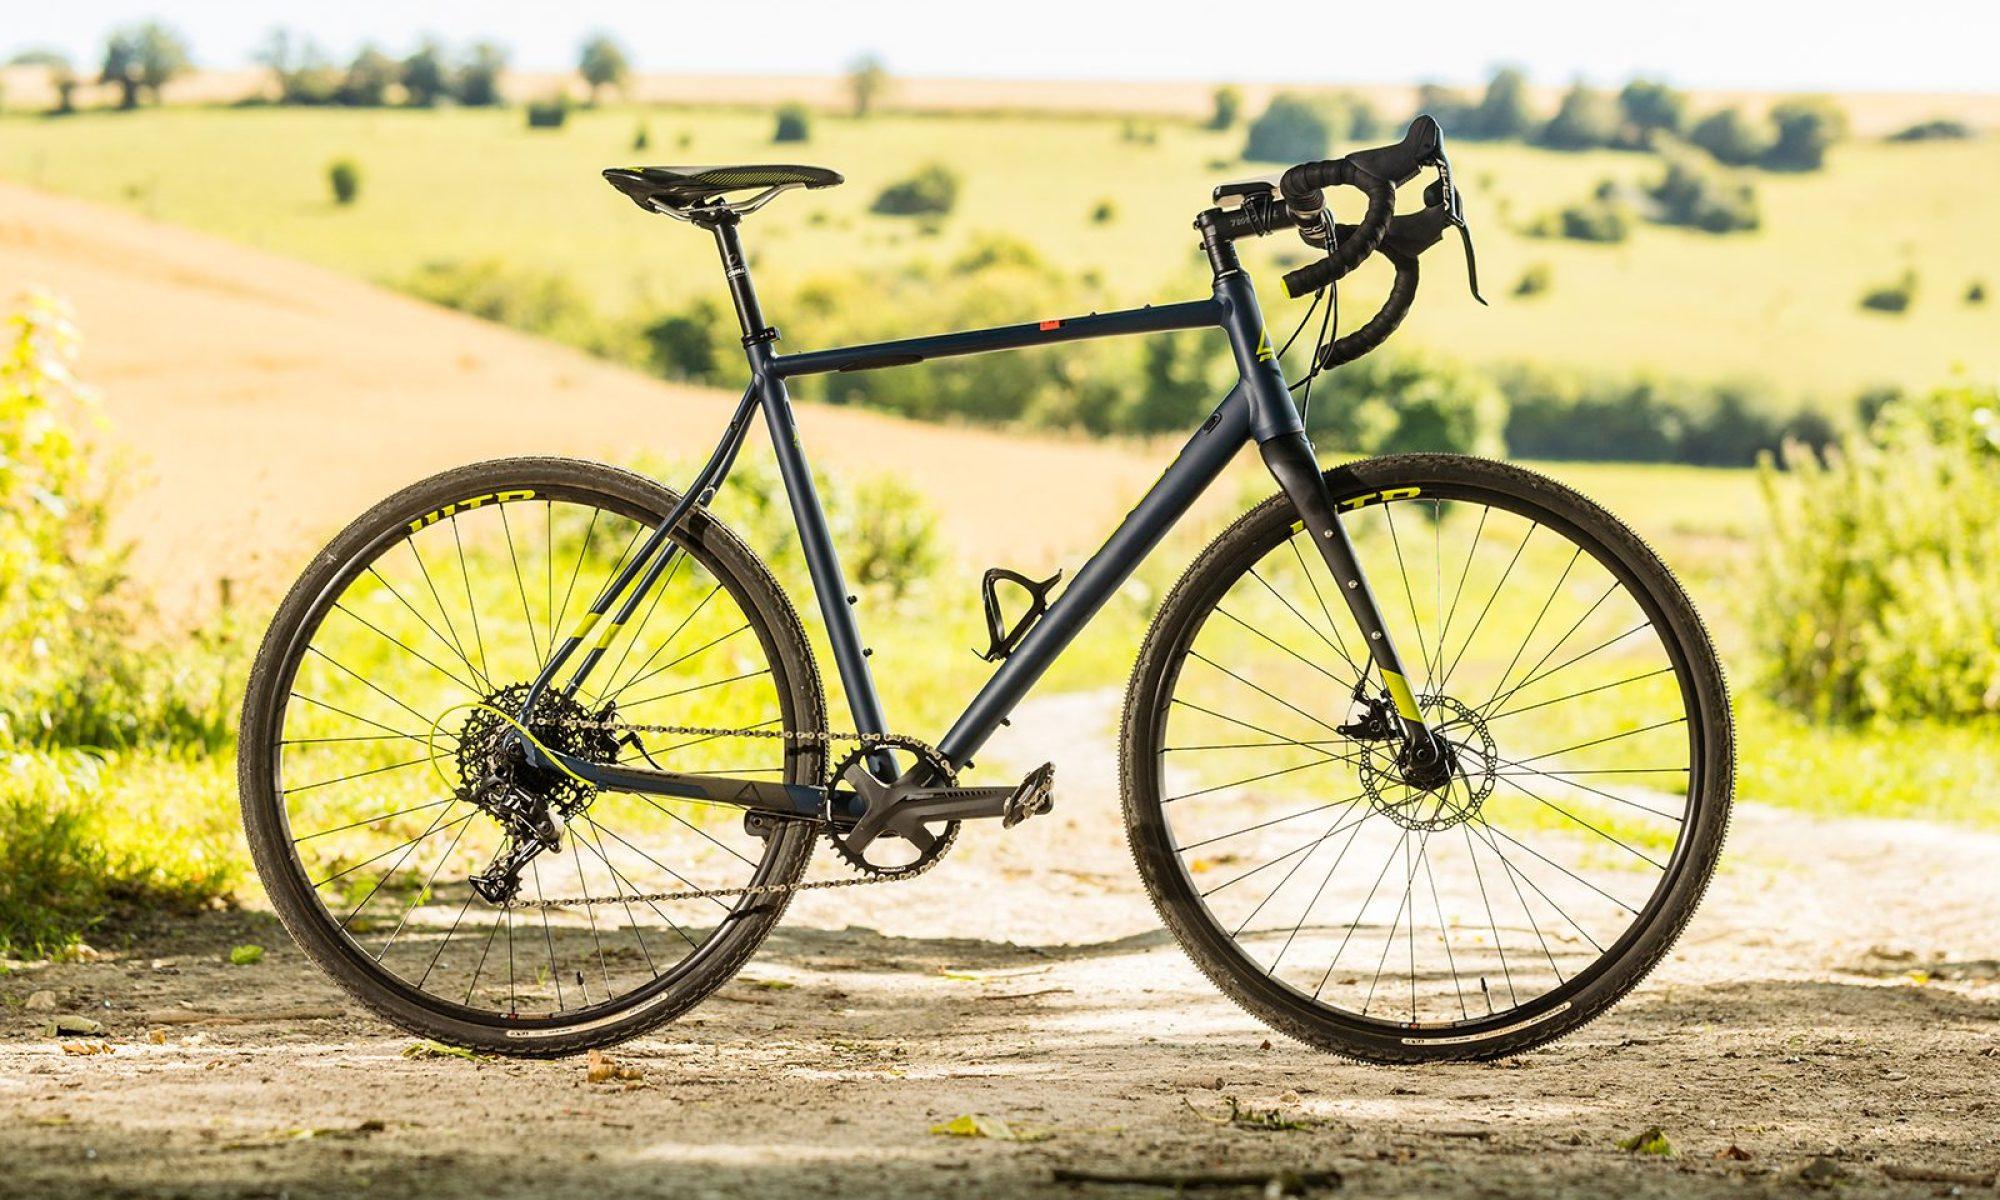 Cheap gravel bikes: affordable adventure bikes for dirt, gravel and commuting